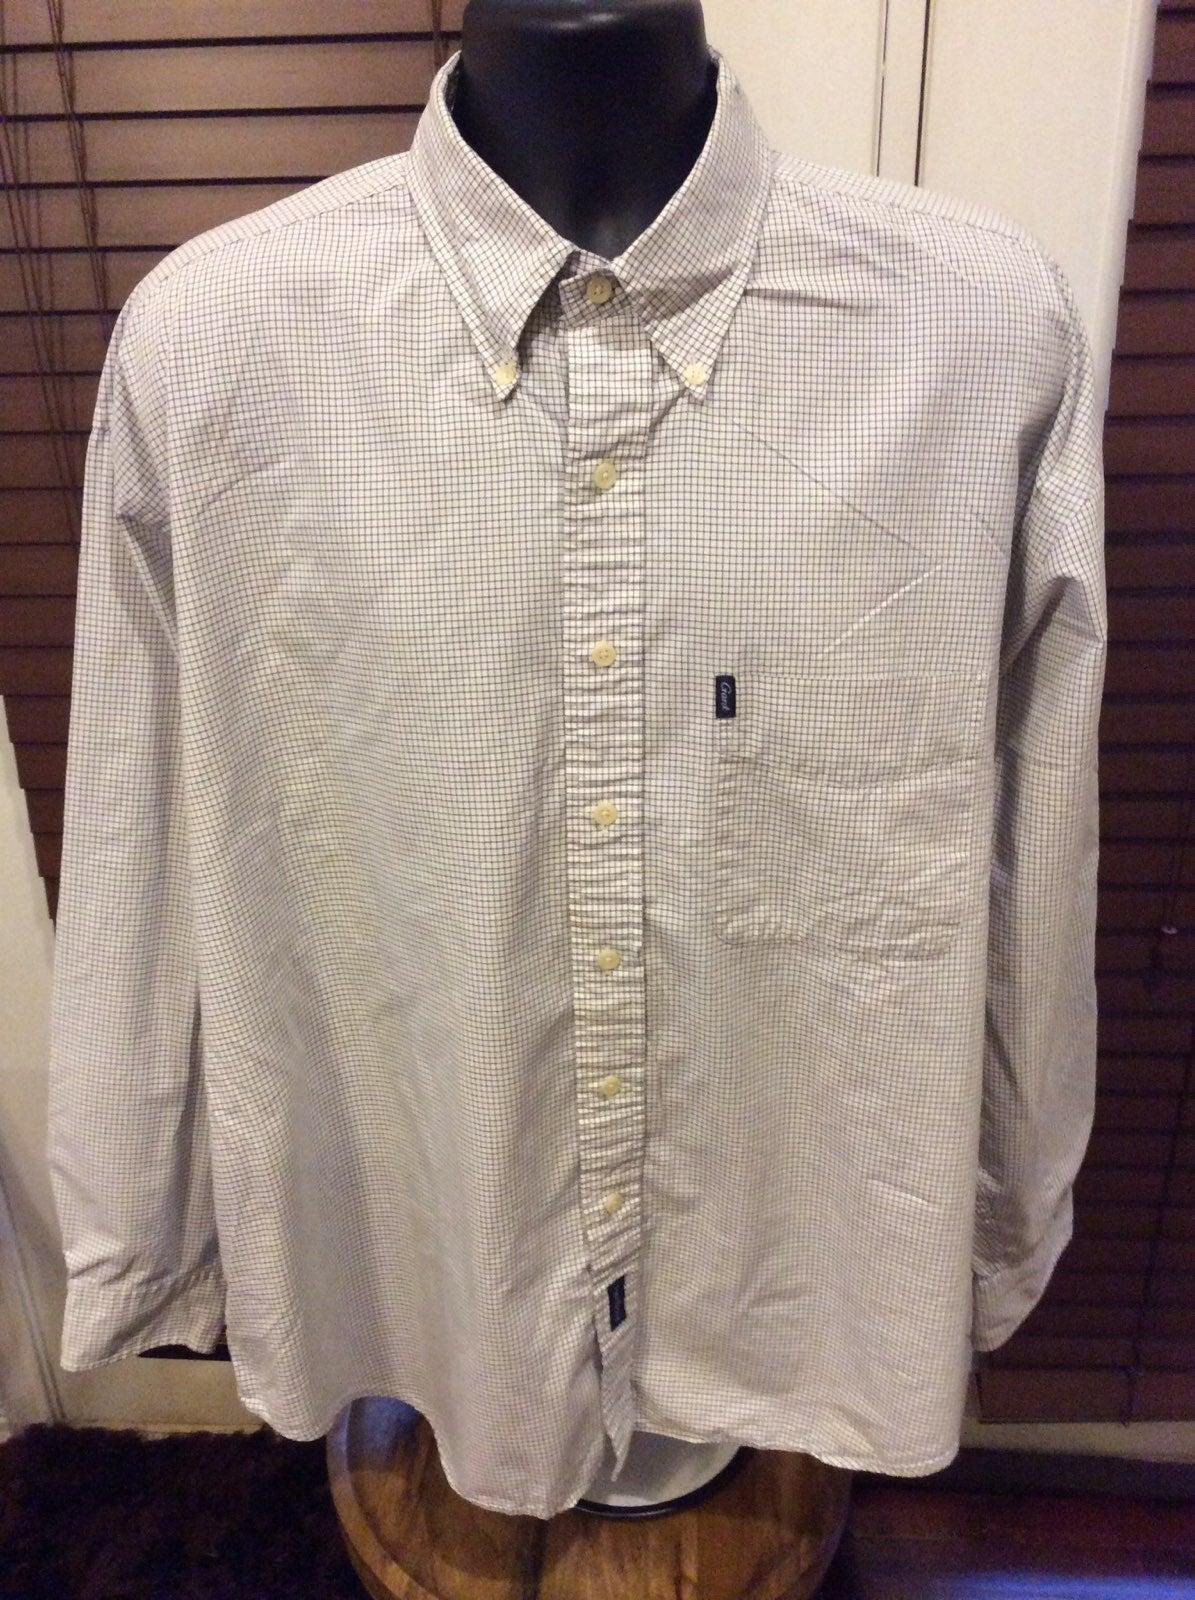 GANT Micro Tartans Men's Button Shirt XL